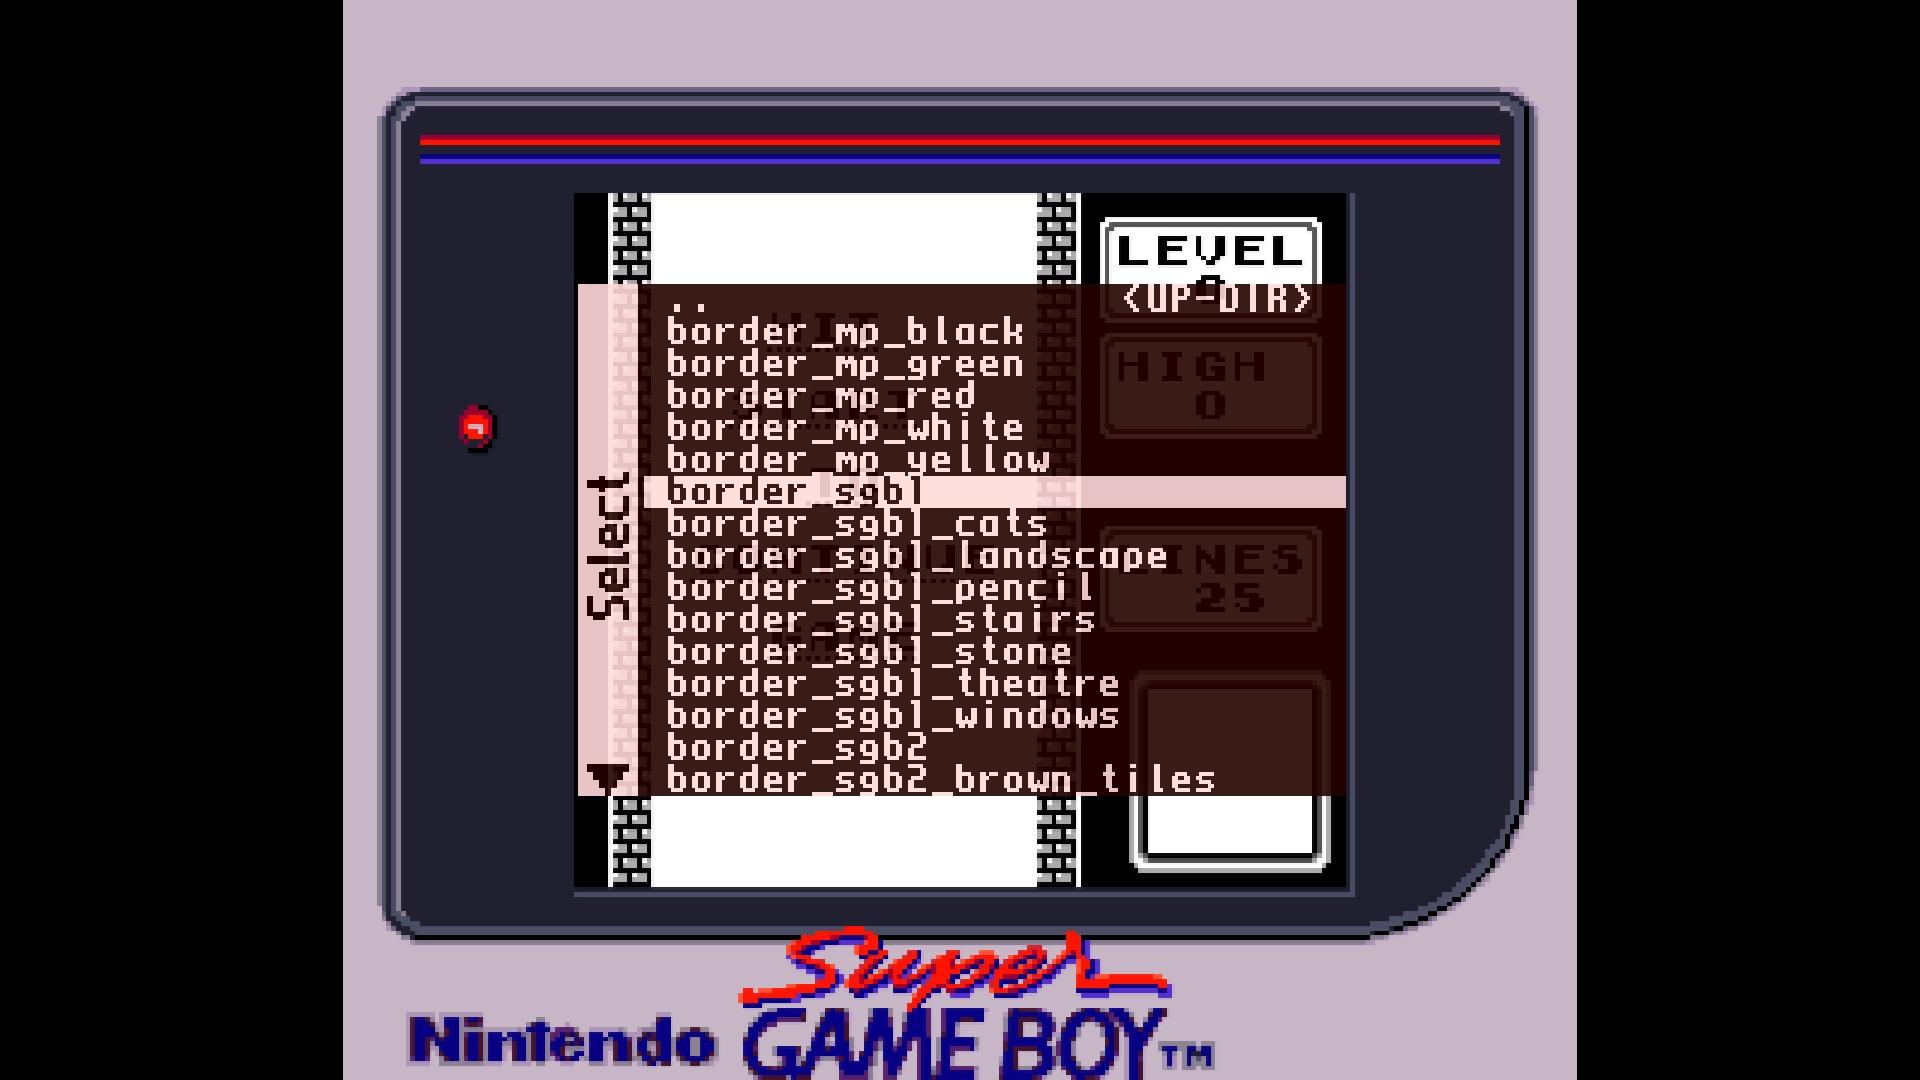 MiSTer Super Game Boy Borders